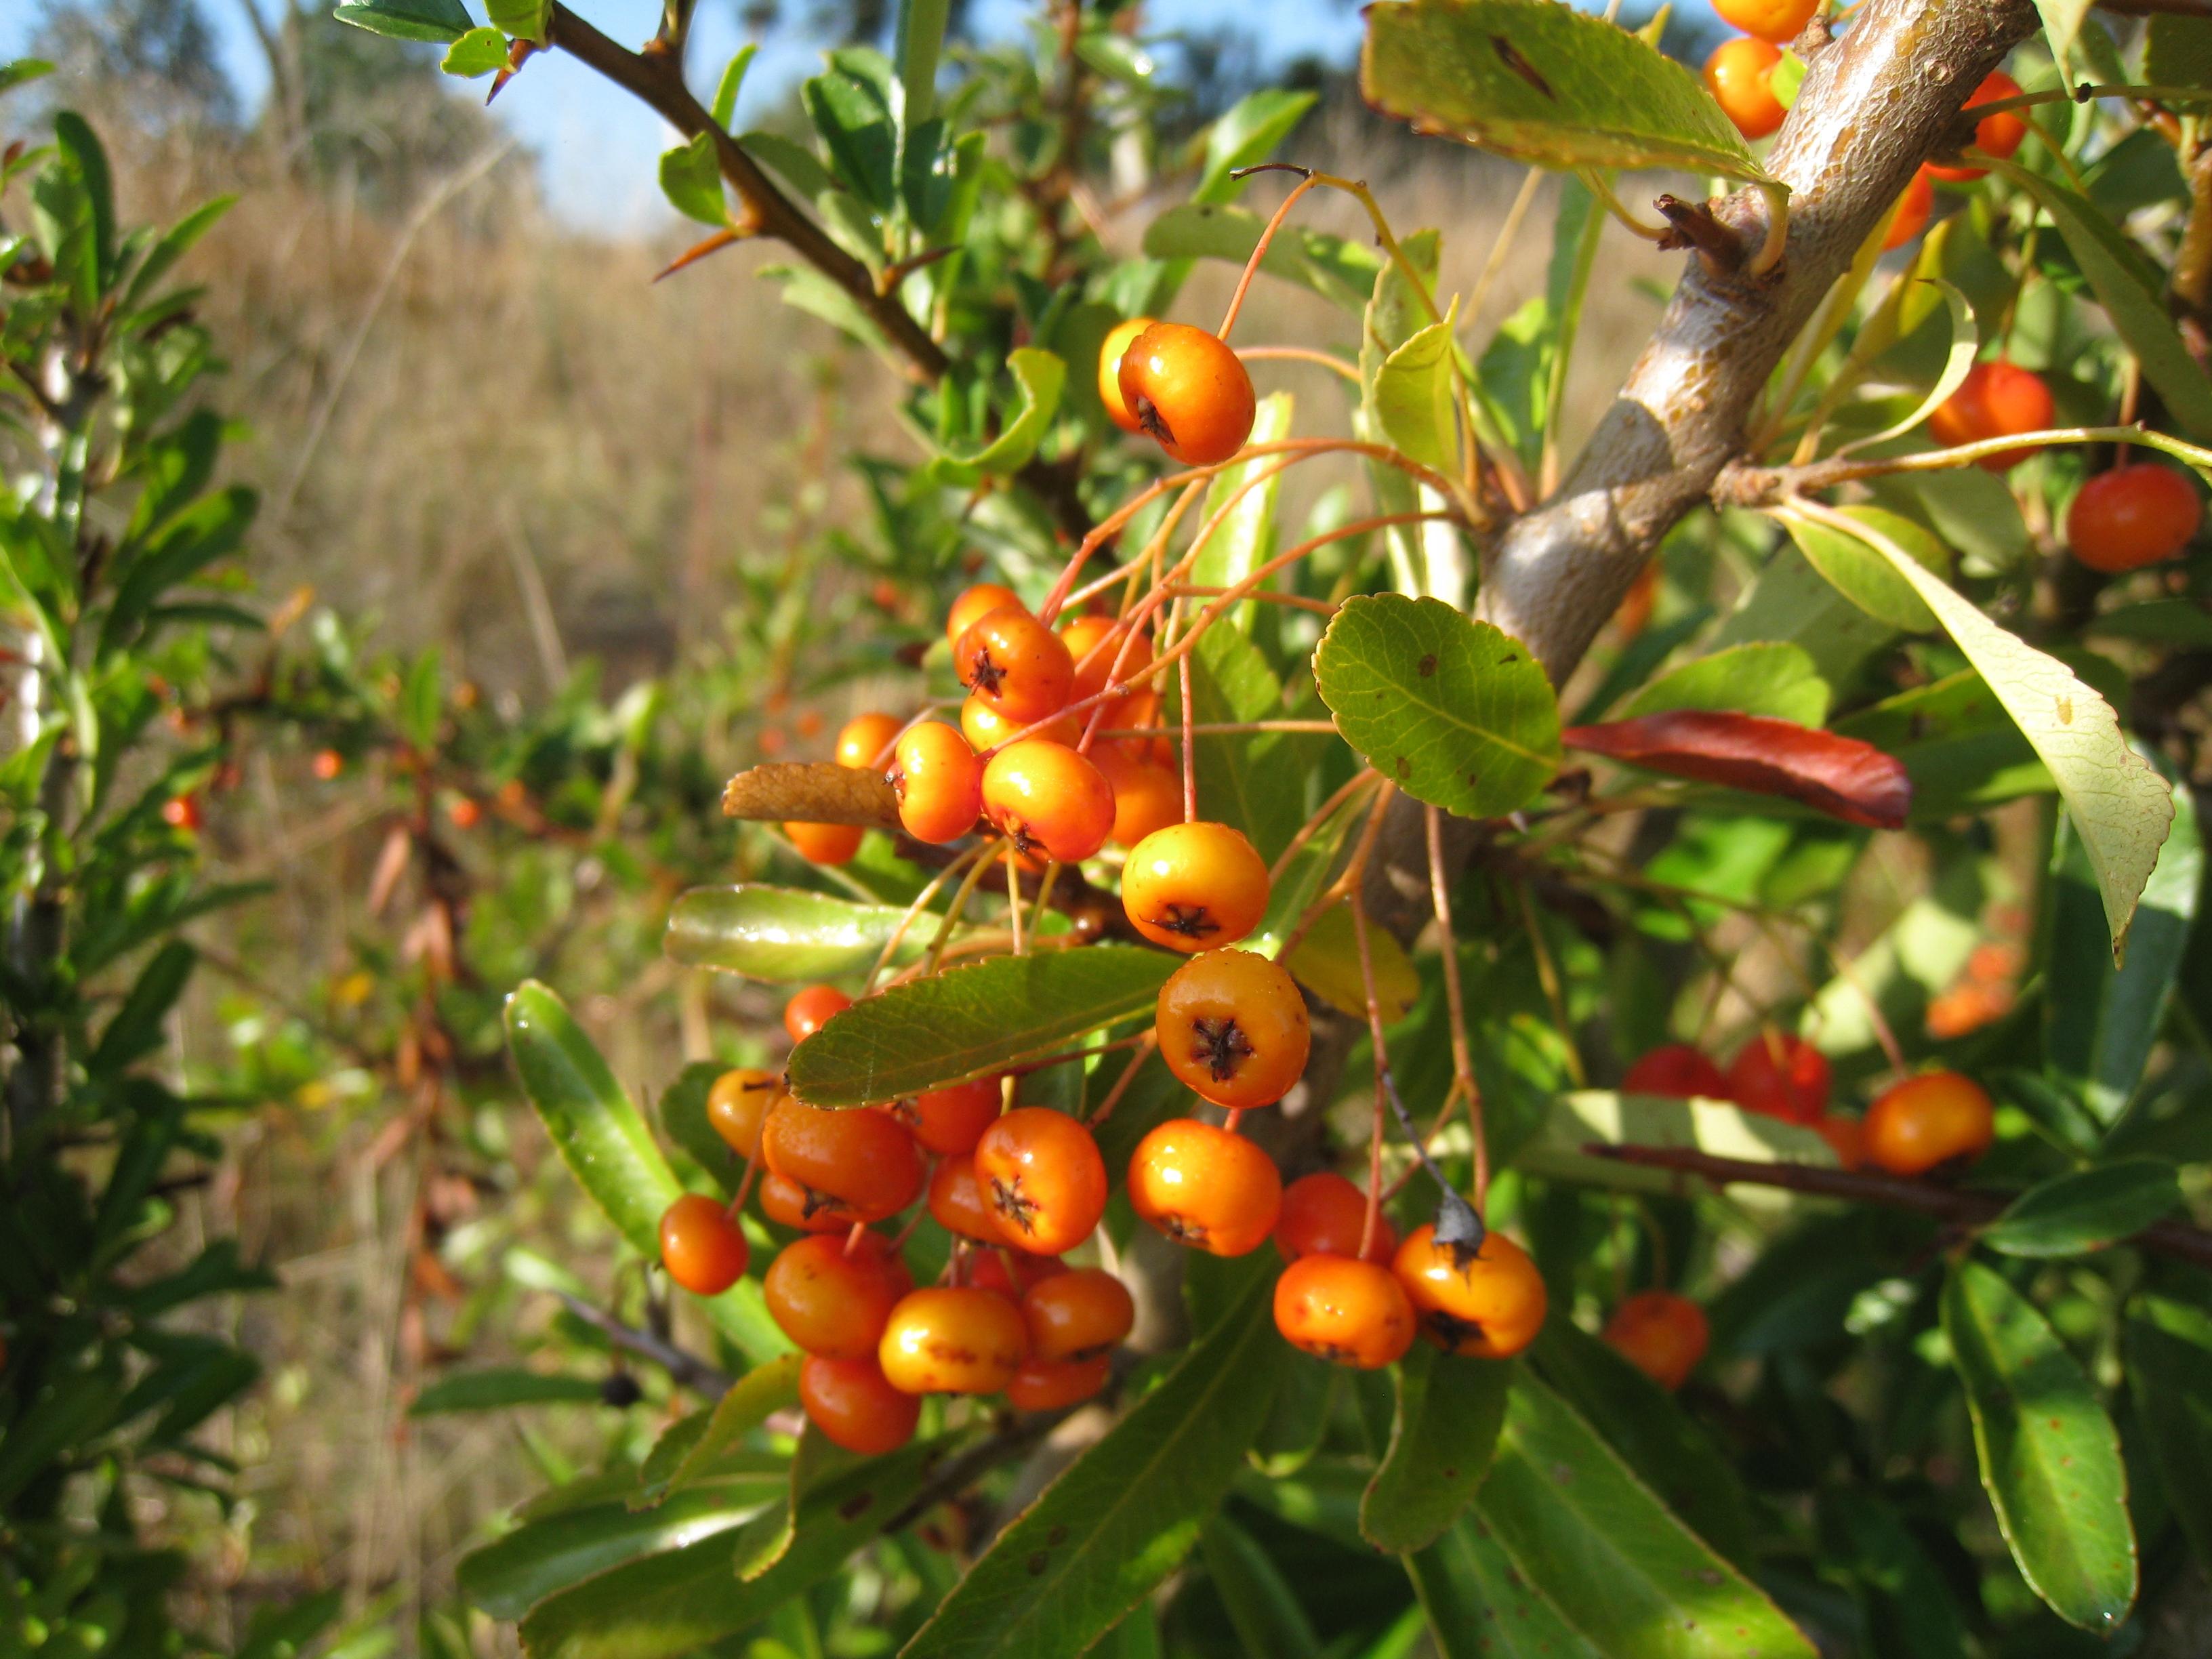 File Spiky Bush With Orange Berries 5585055400 Jpg Wikimedia